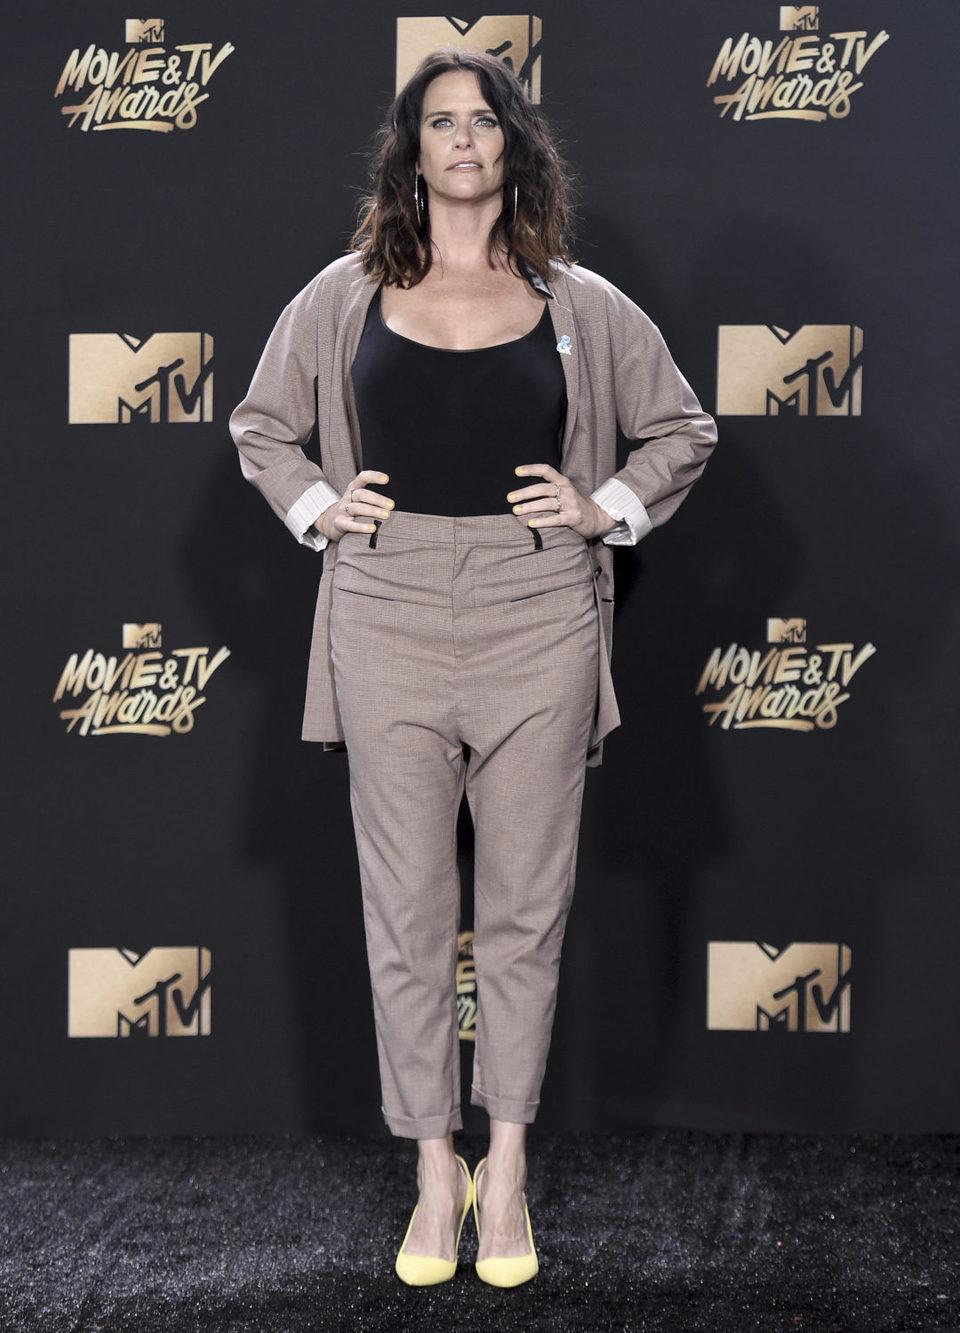 Amy Landecker in the MTV Movie & TV Awards 2017 gala ...